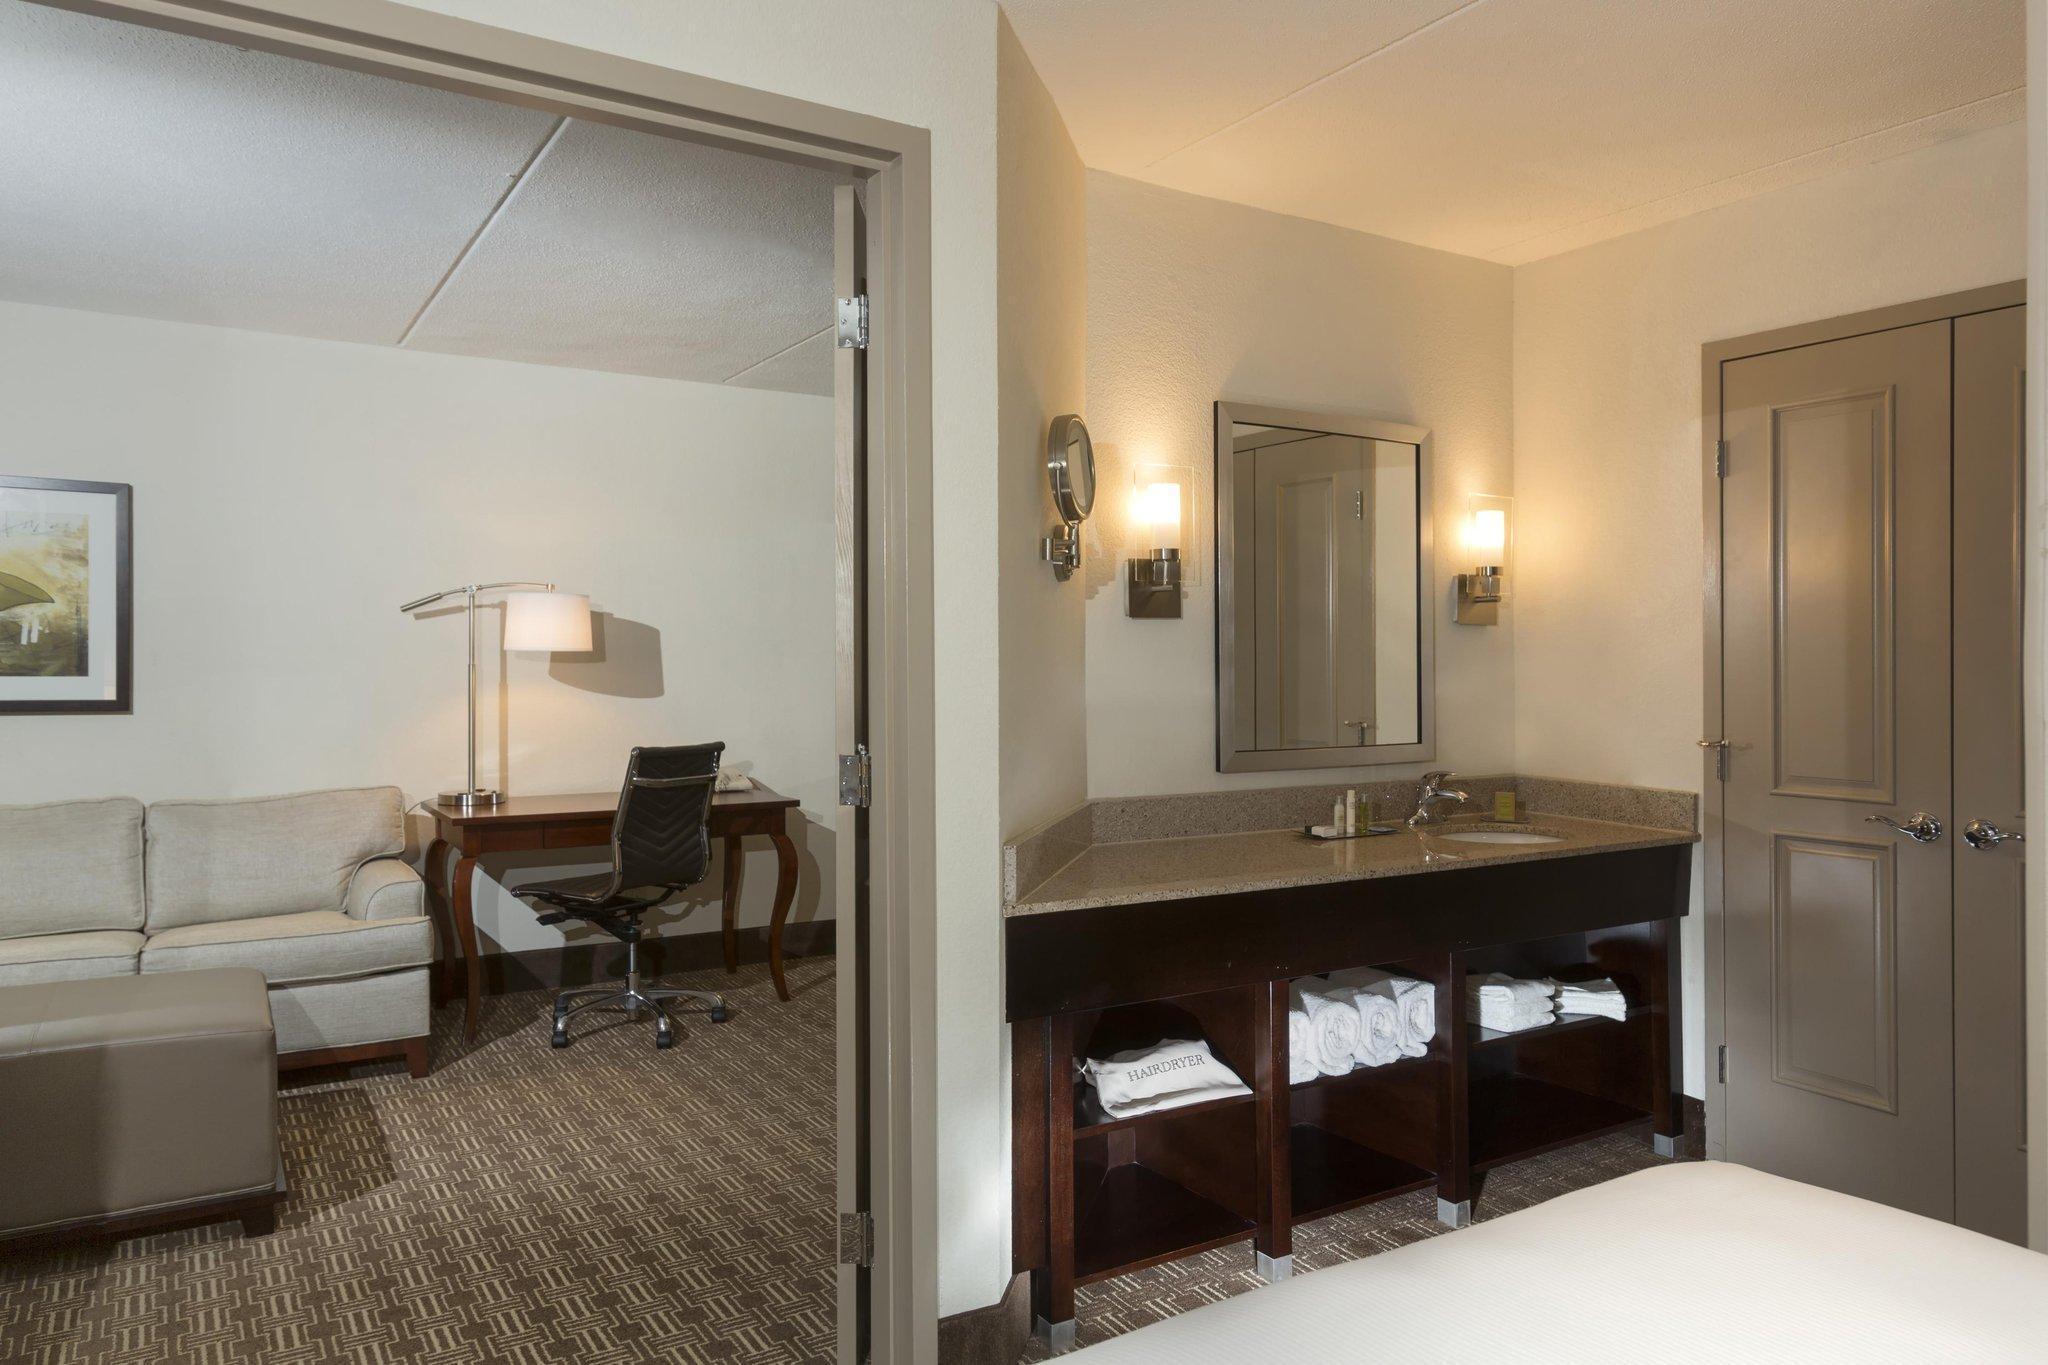 Doubletree Guest Suites Nashville Airport Hotel